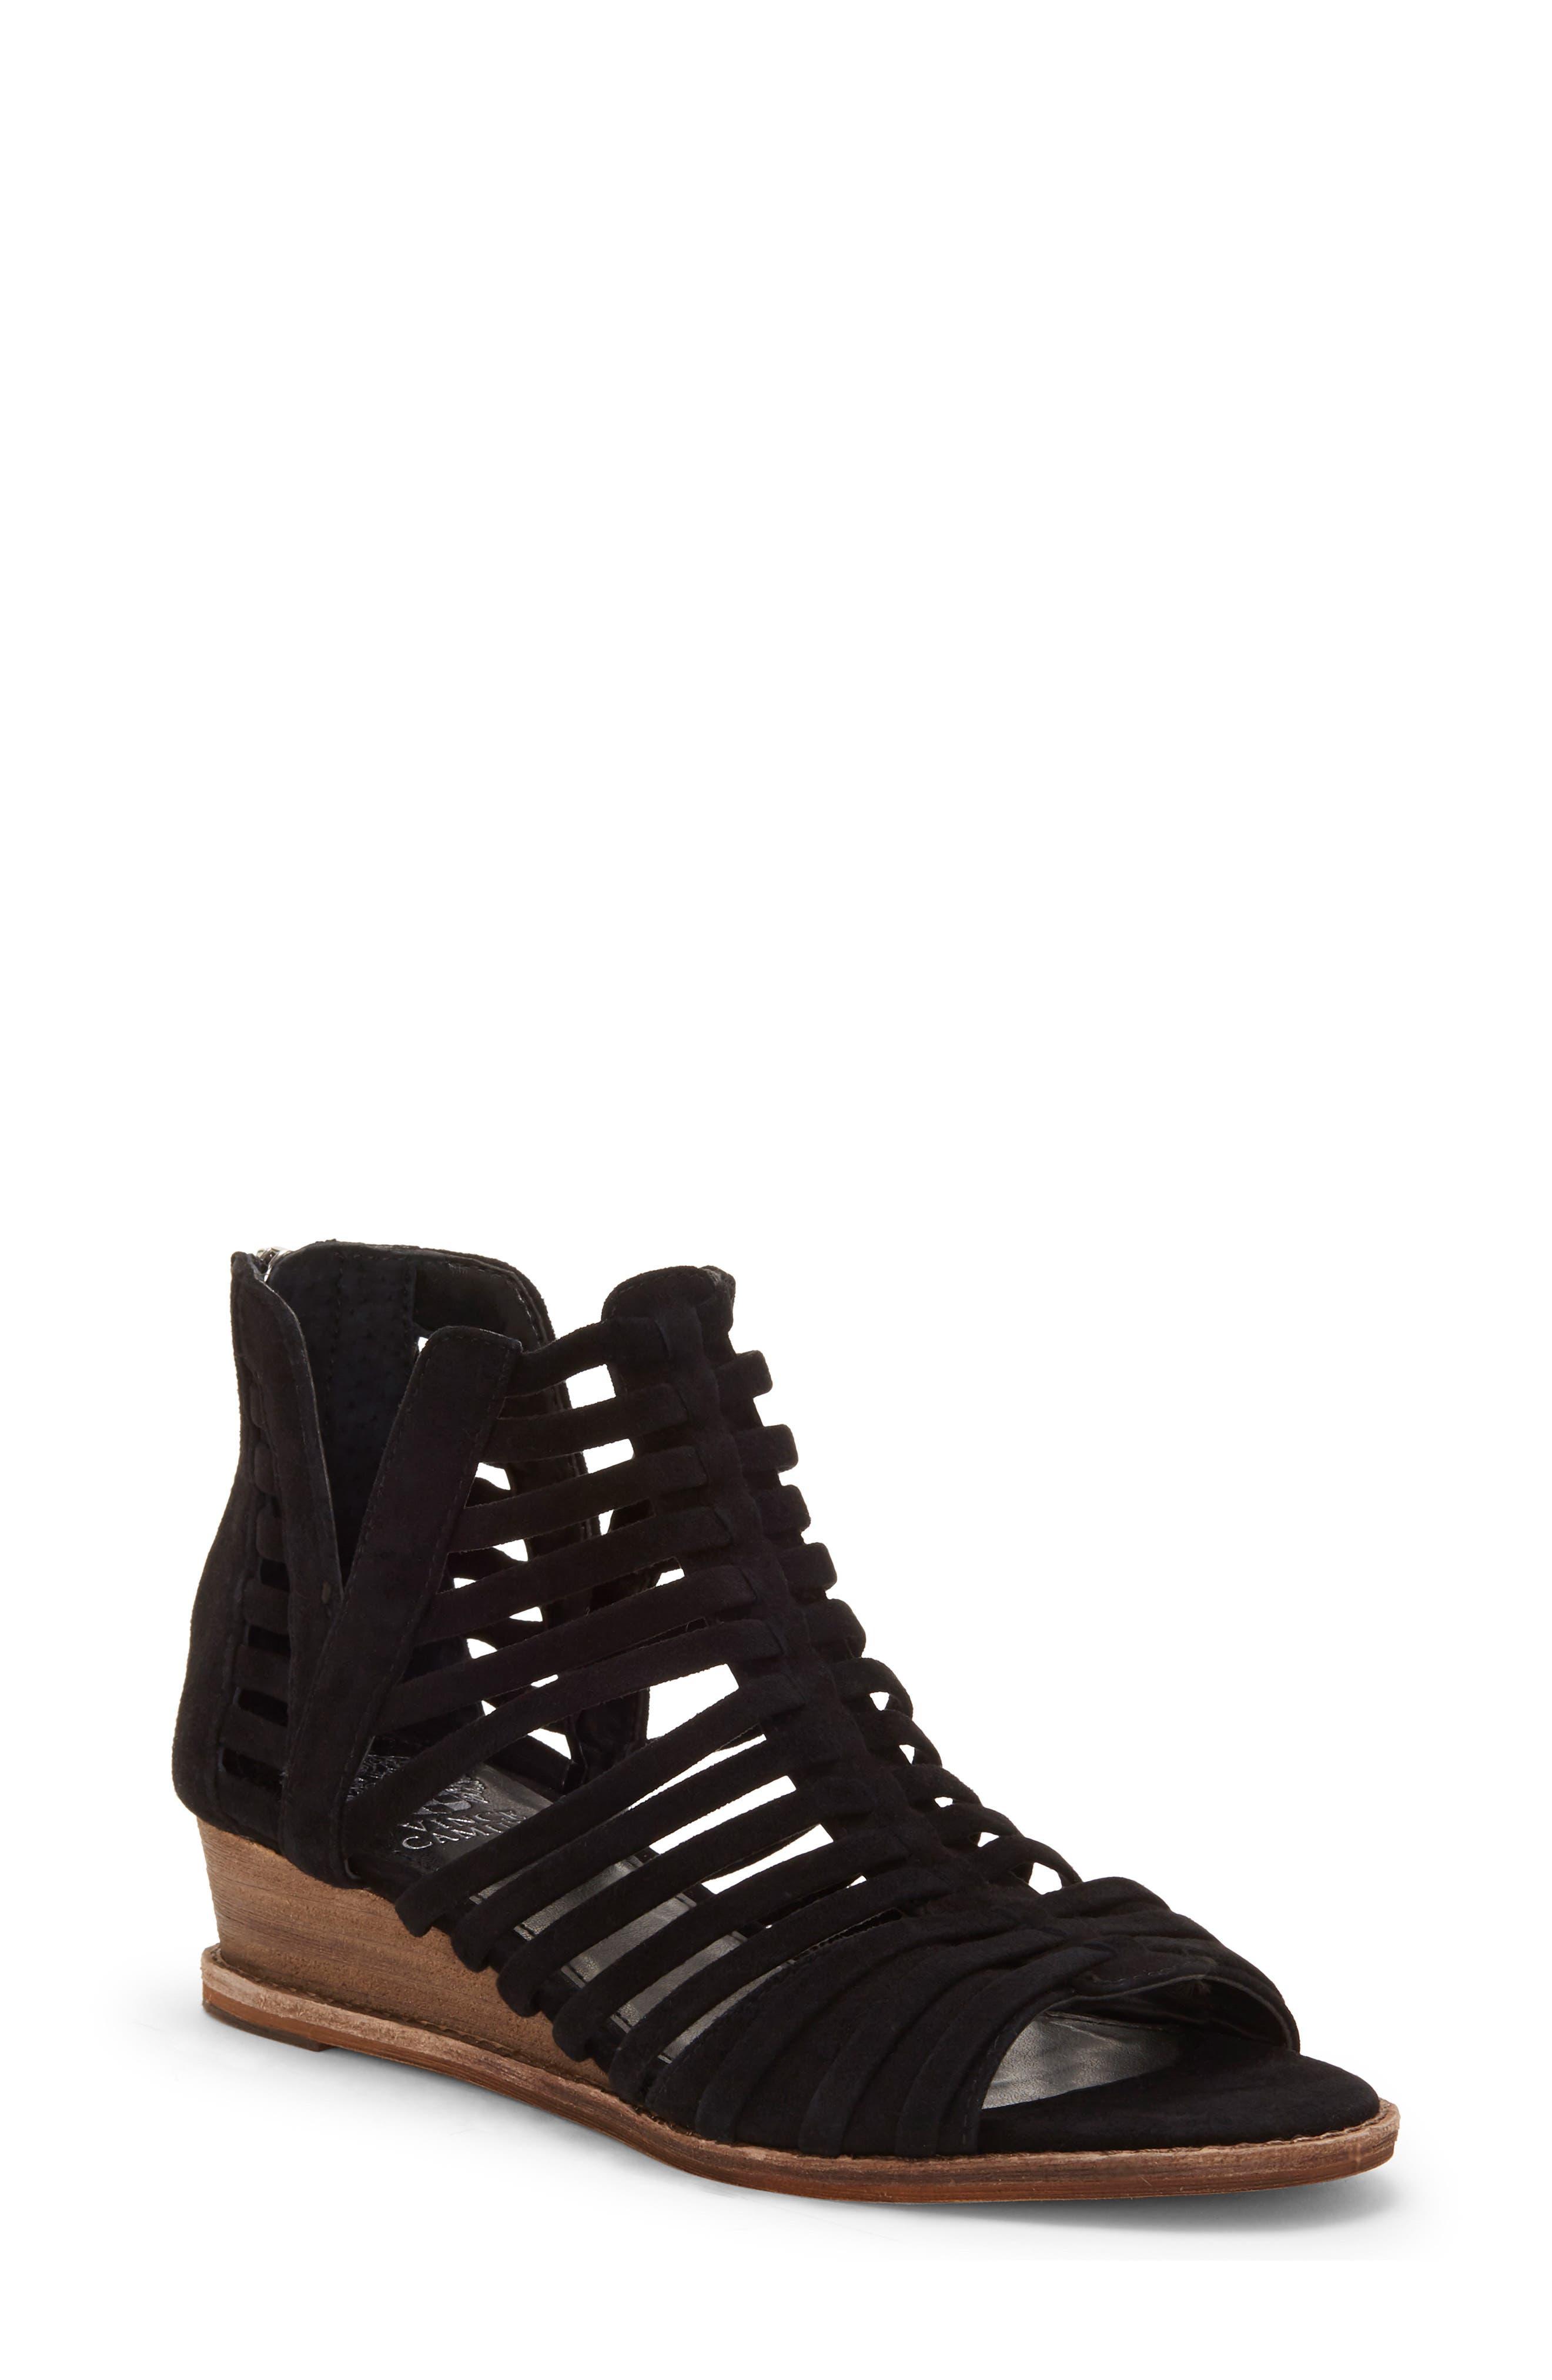 Vince Camuto Revey Wedge Sandal- Black